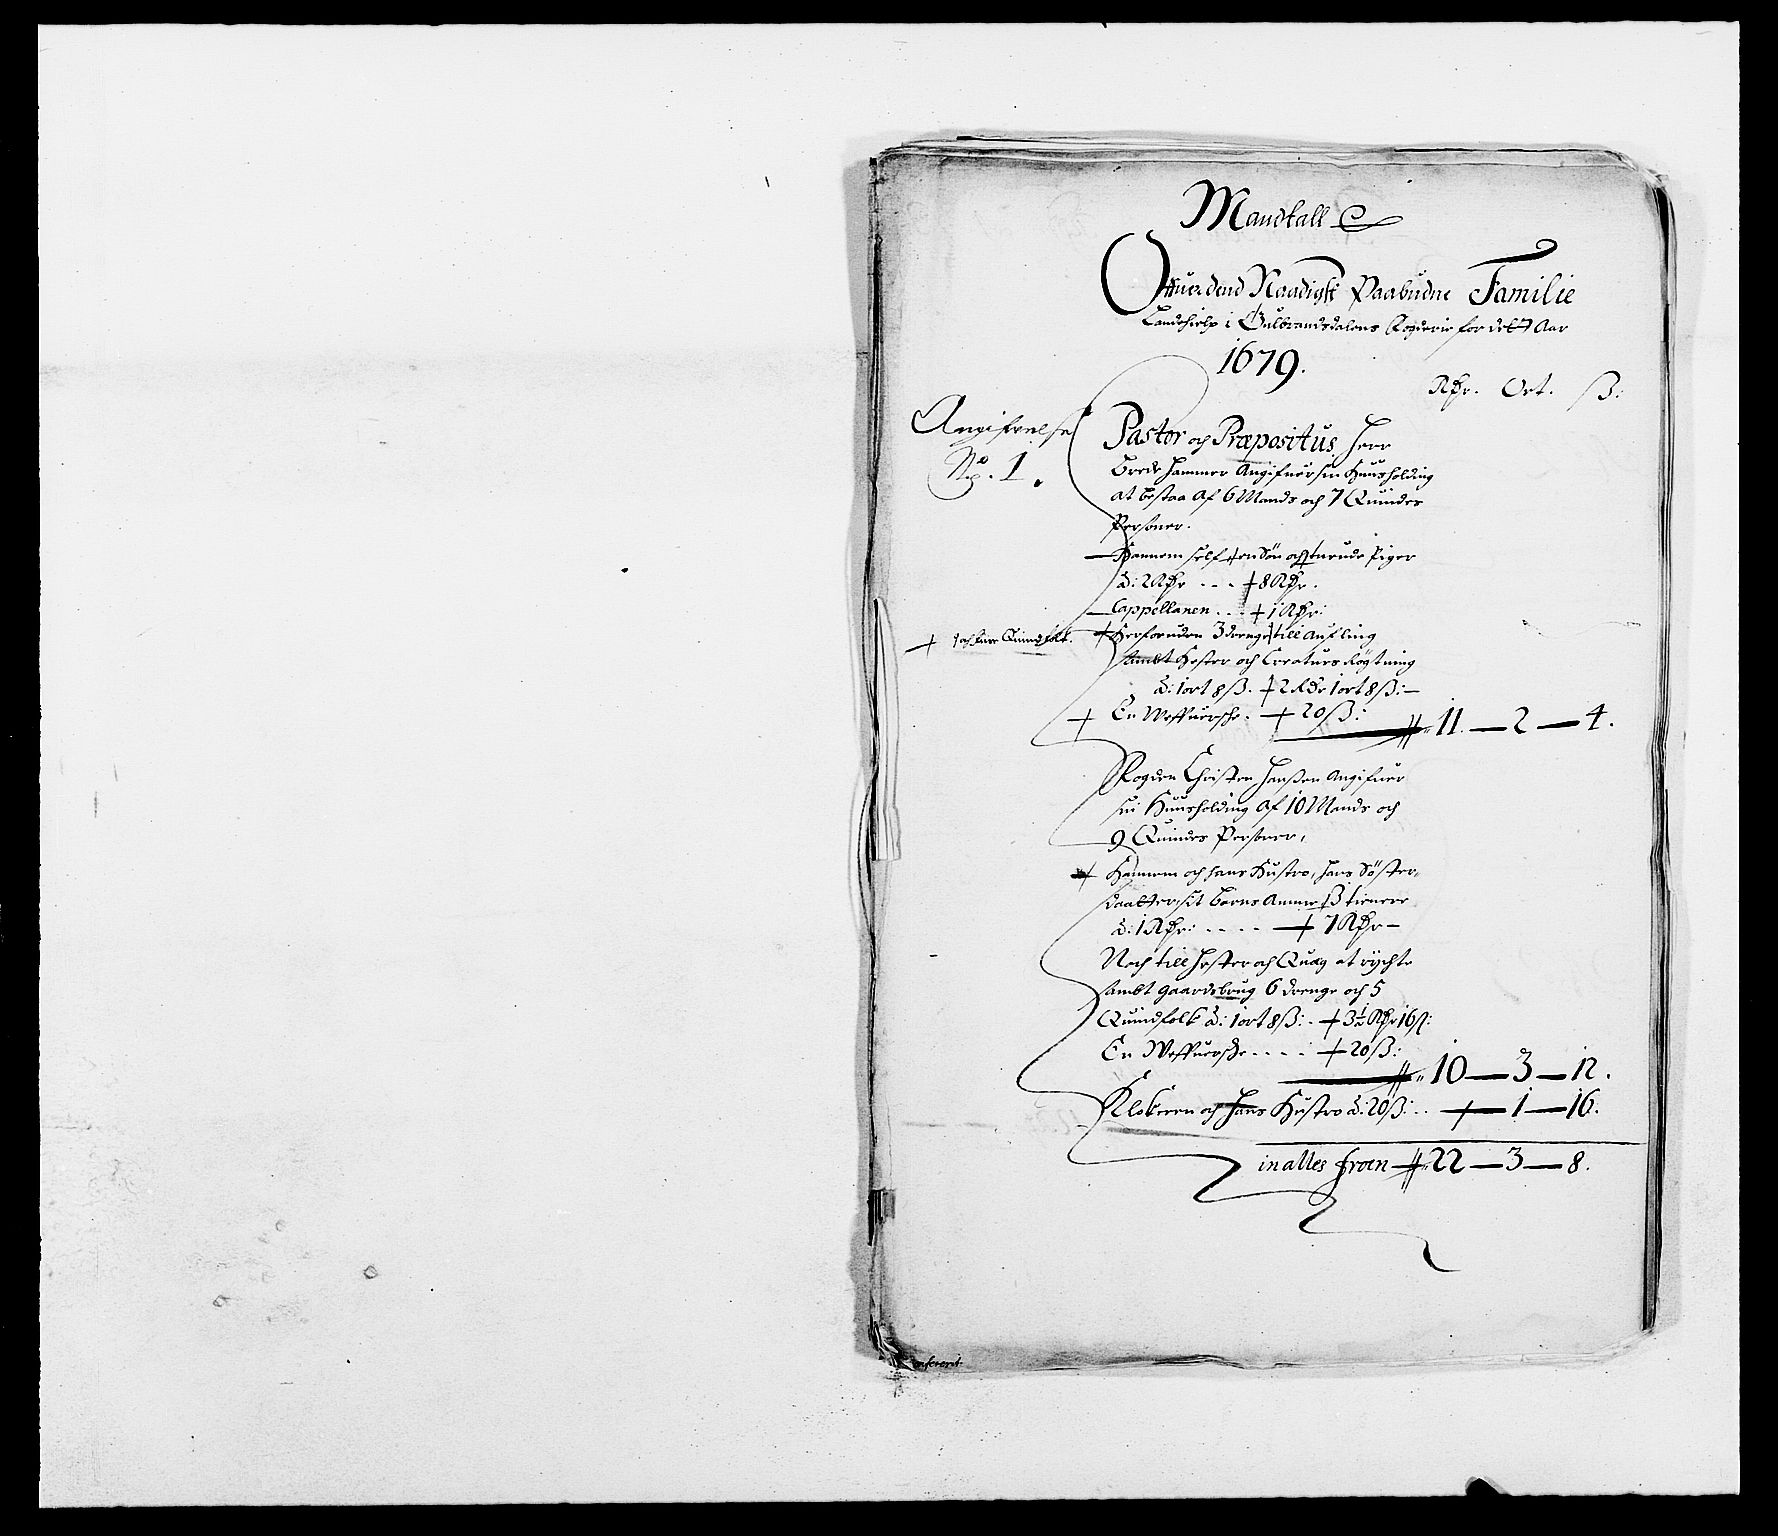 RA, Rentekammeret inntil 1814, Reviderte regnskaper, Fogderegnskap, R17/L1153: Fogderegnskap Gudbrandsdal, 1678-1679, s. 294